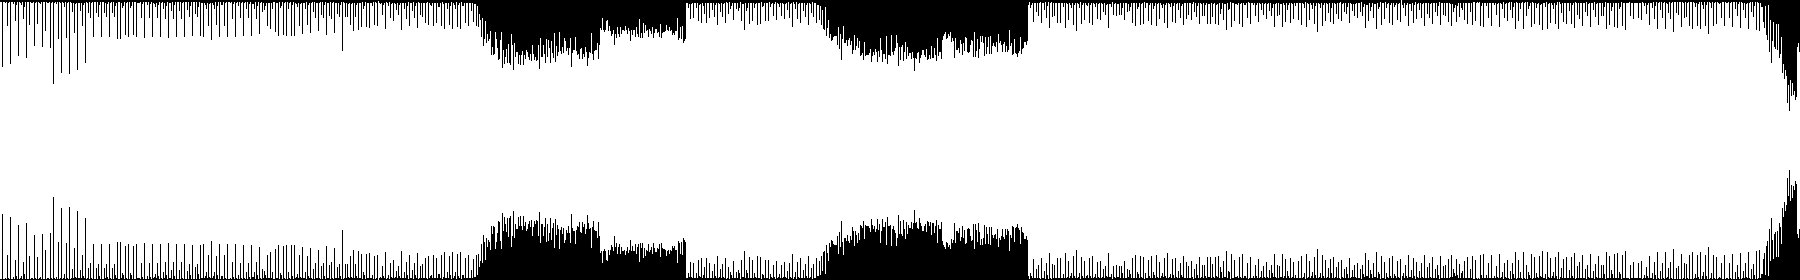 Titan - Camelphat Style Ableton Live Template audio waveform